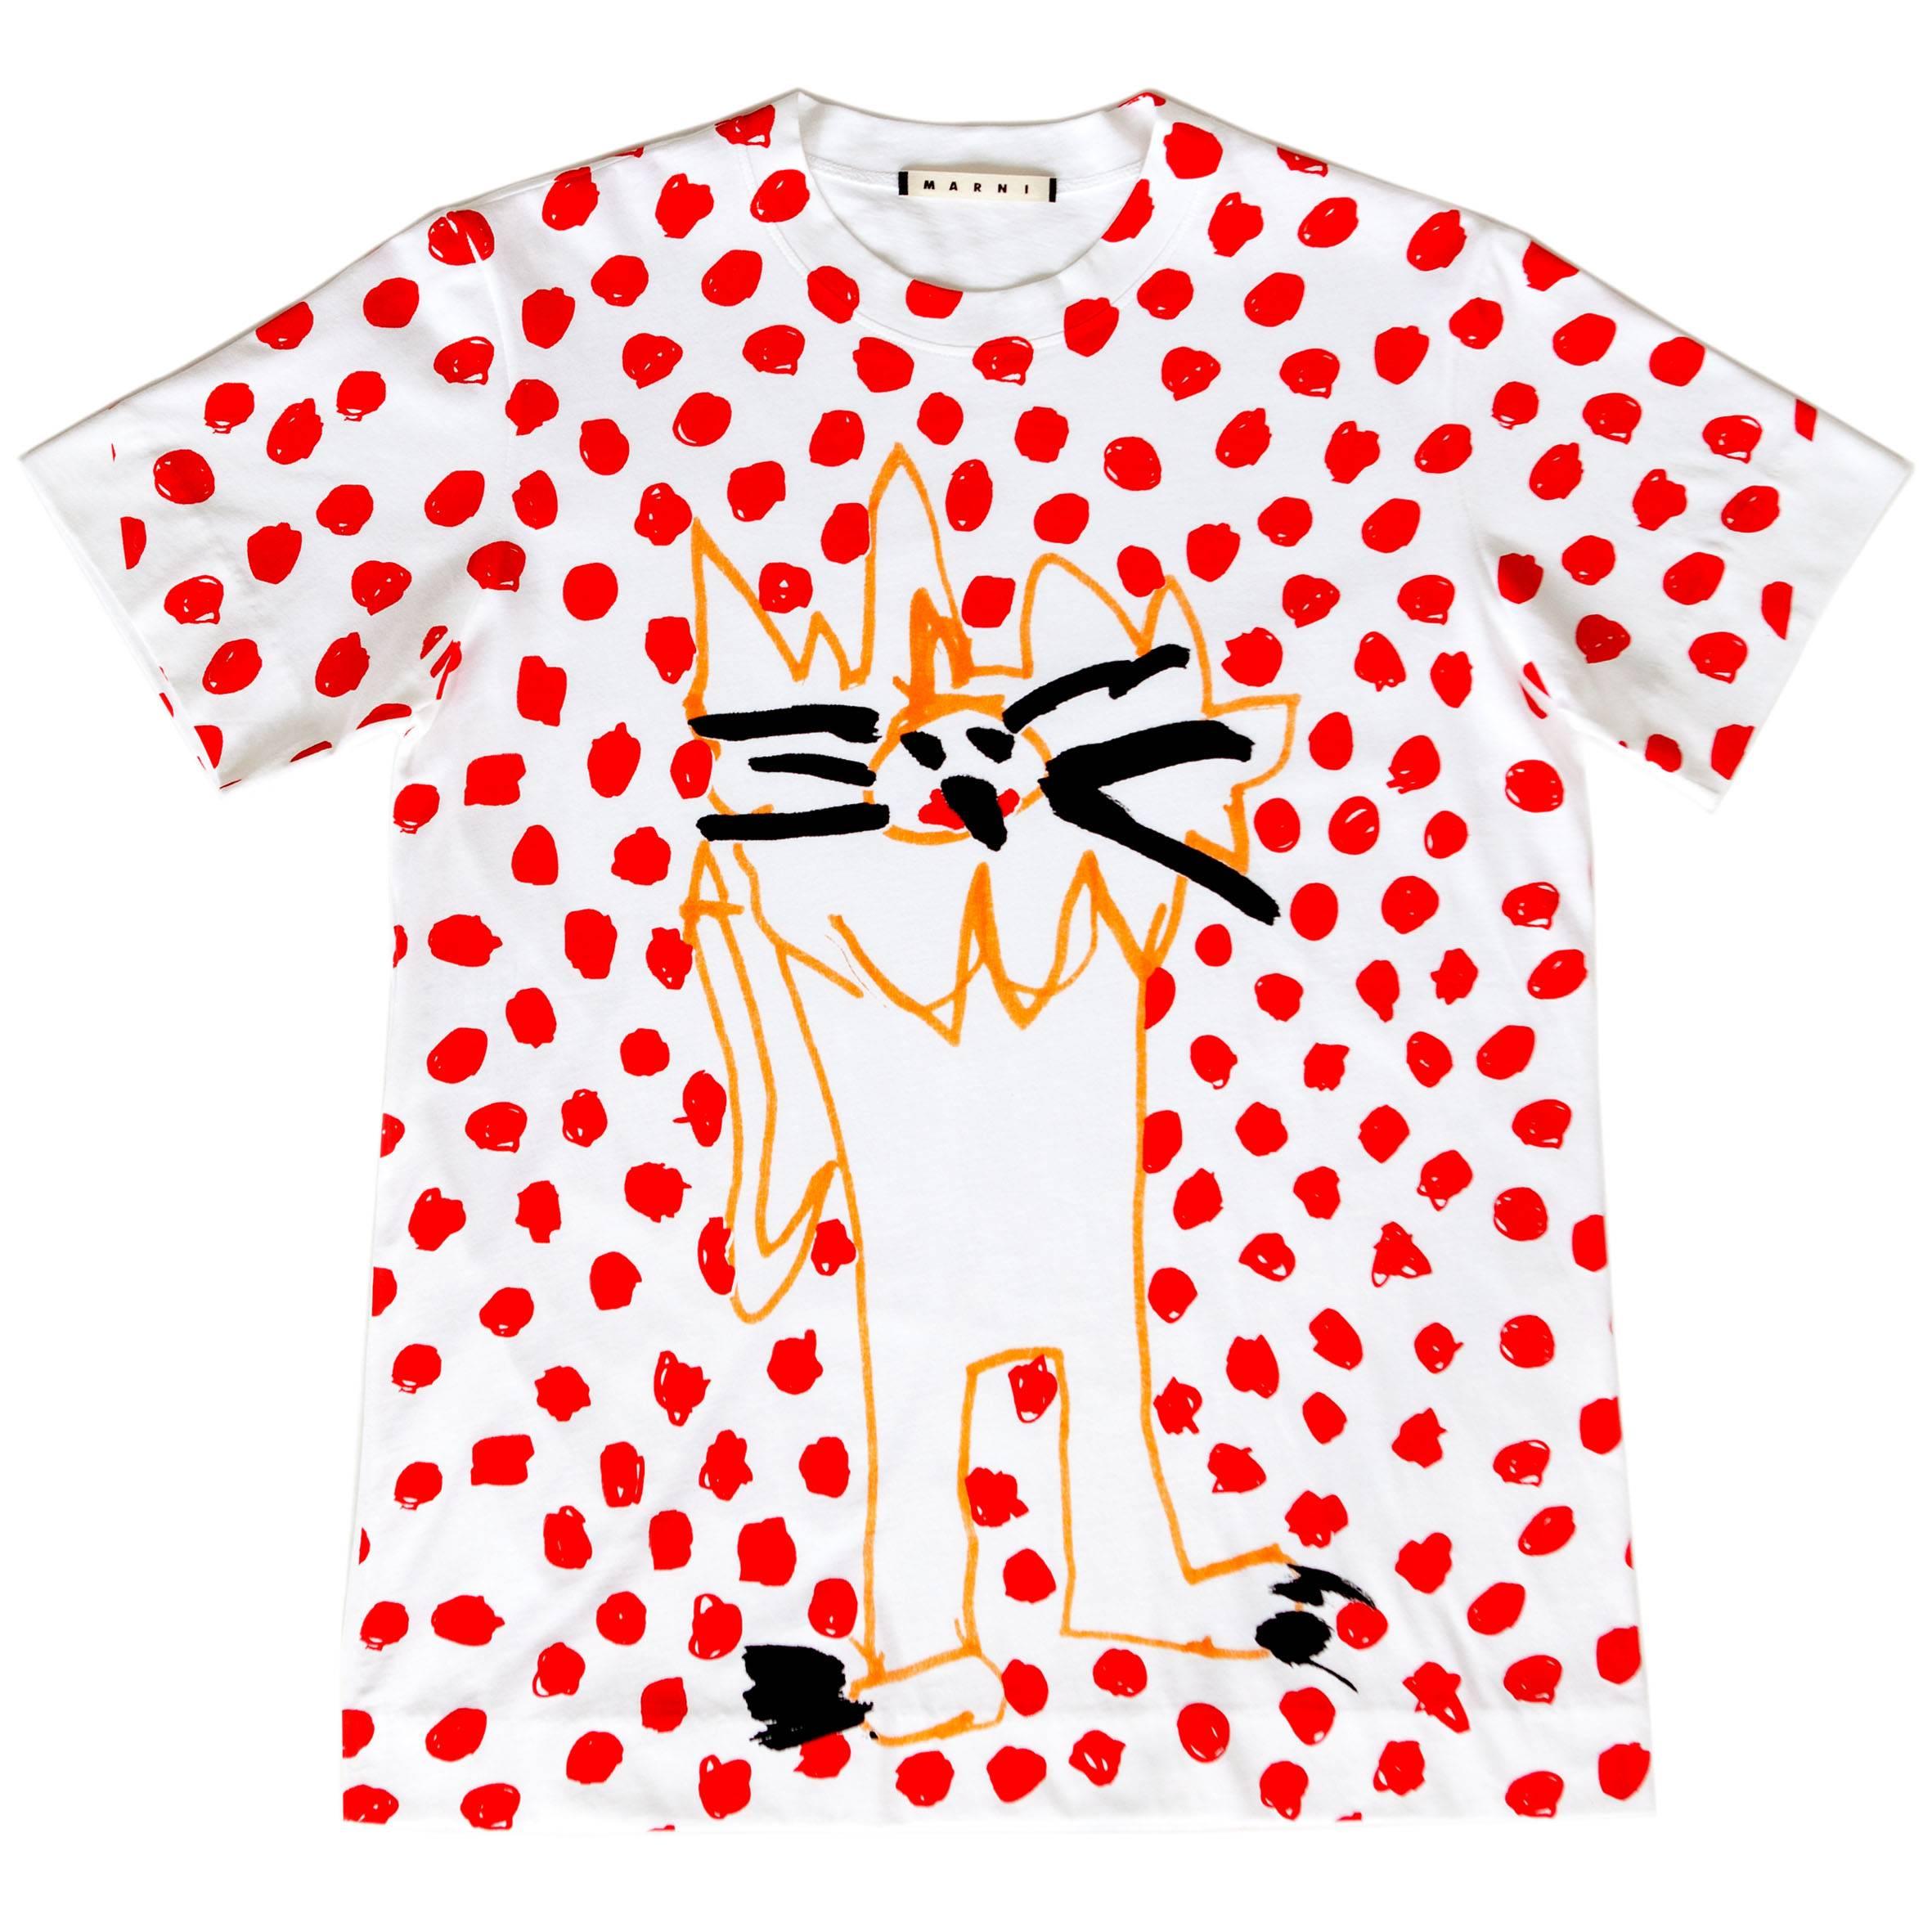 01  T-shirt MARNI CHARITY Project